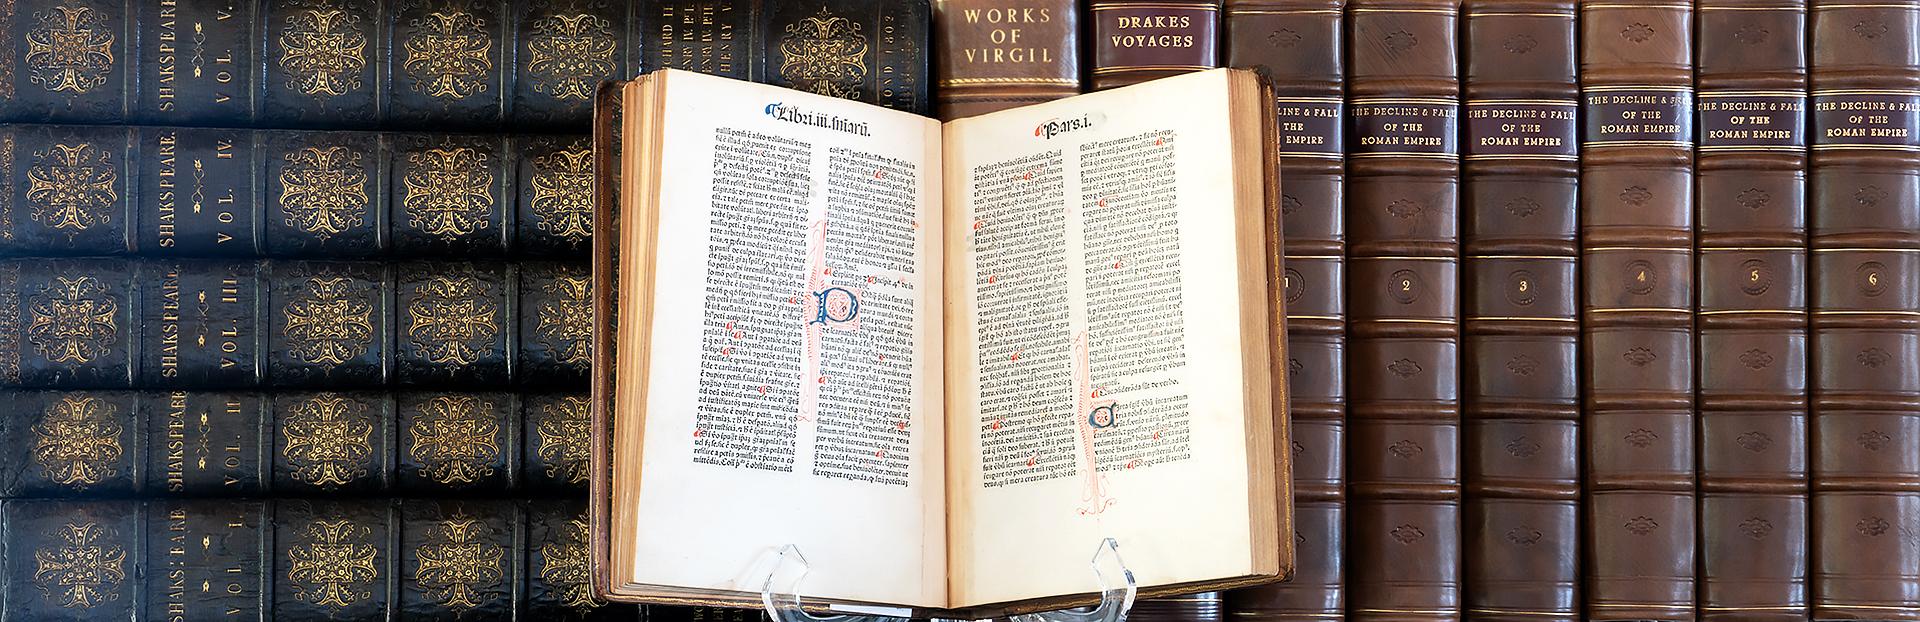 Rare Books and Incunabula